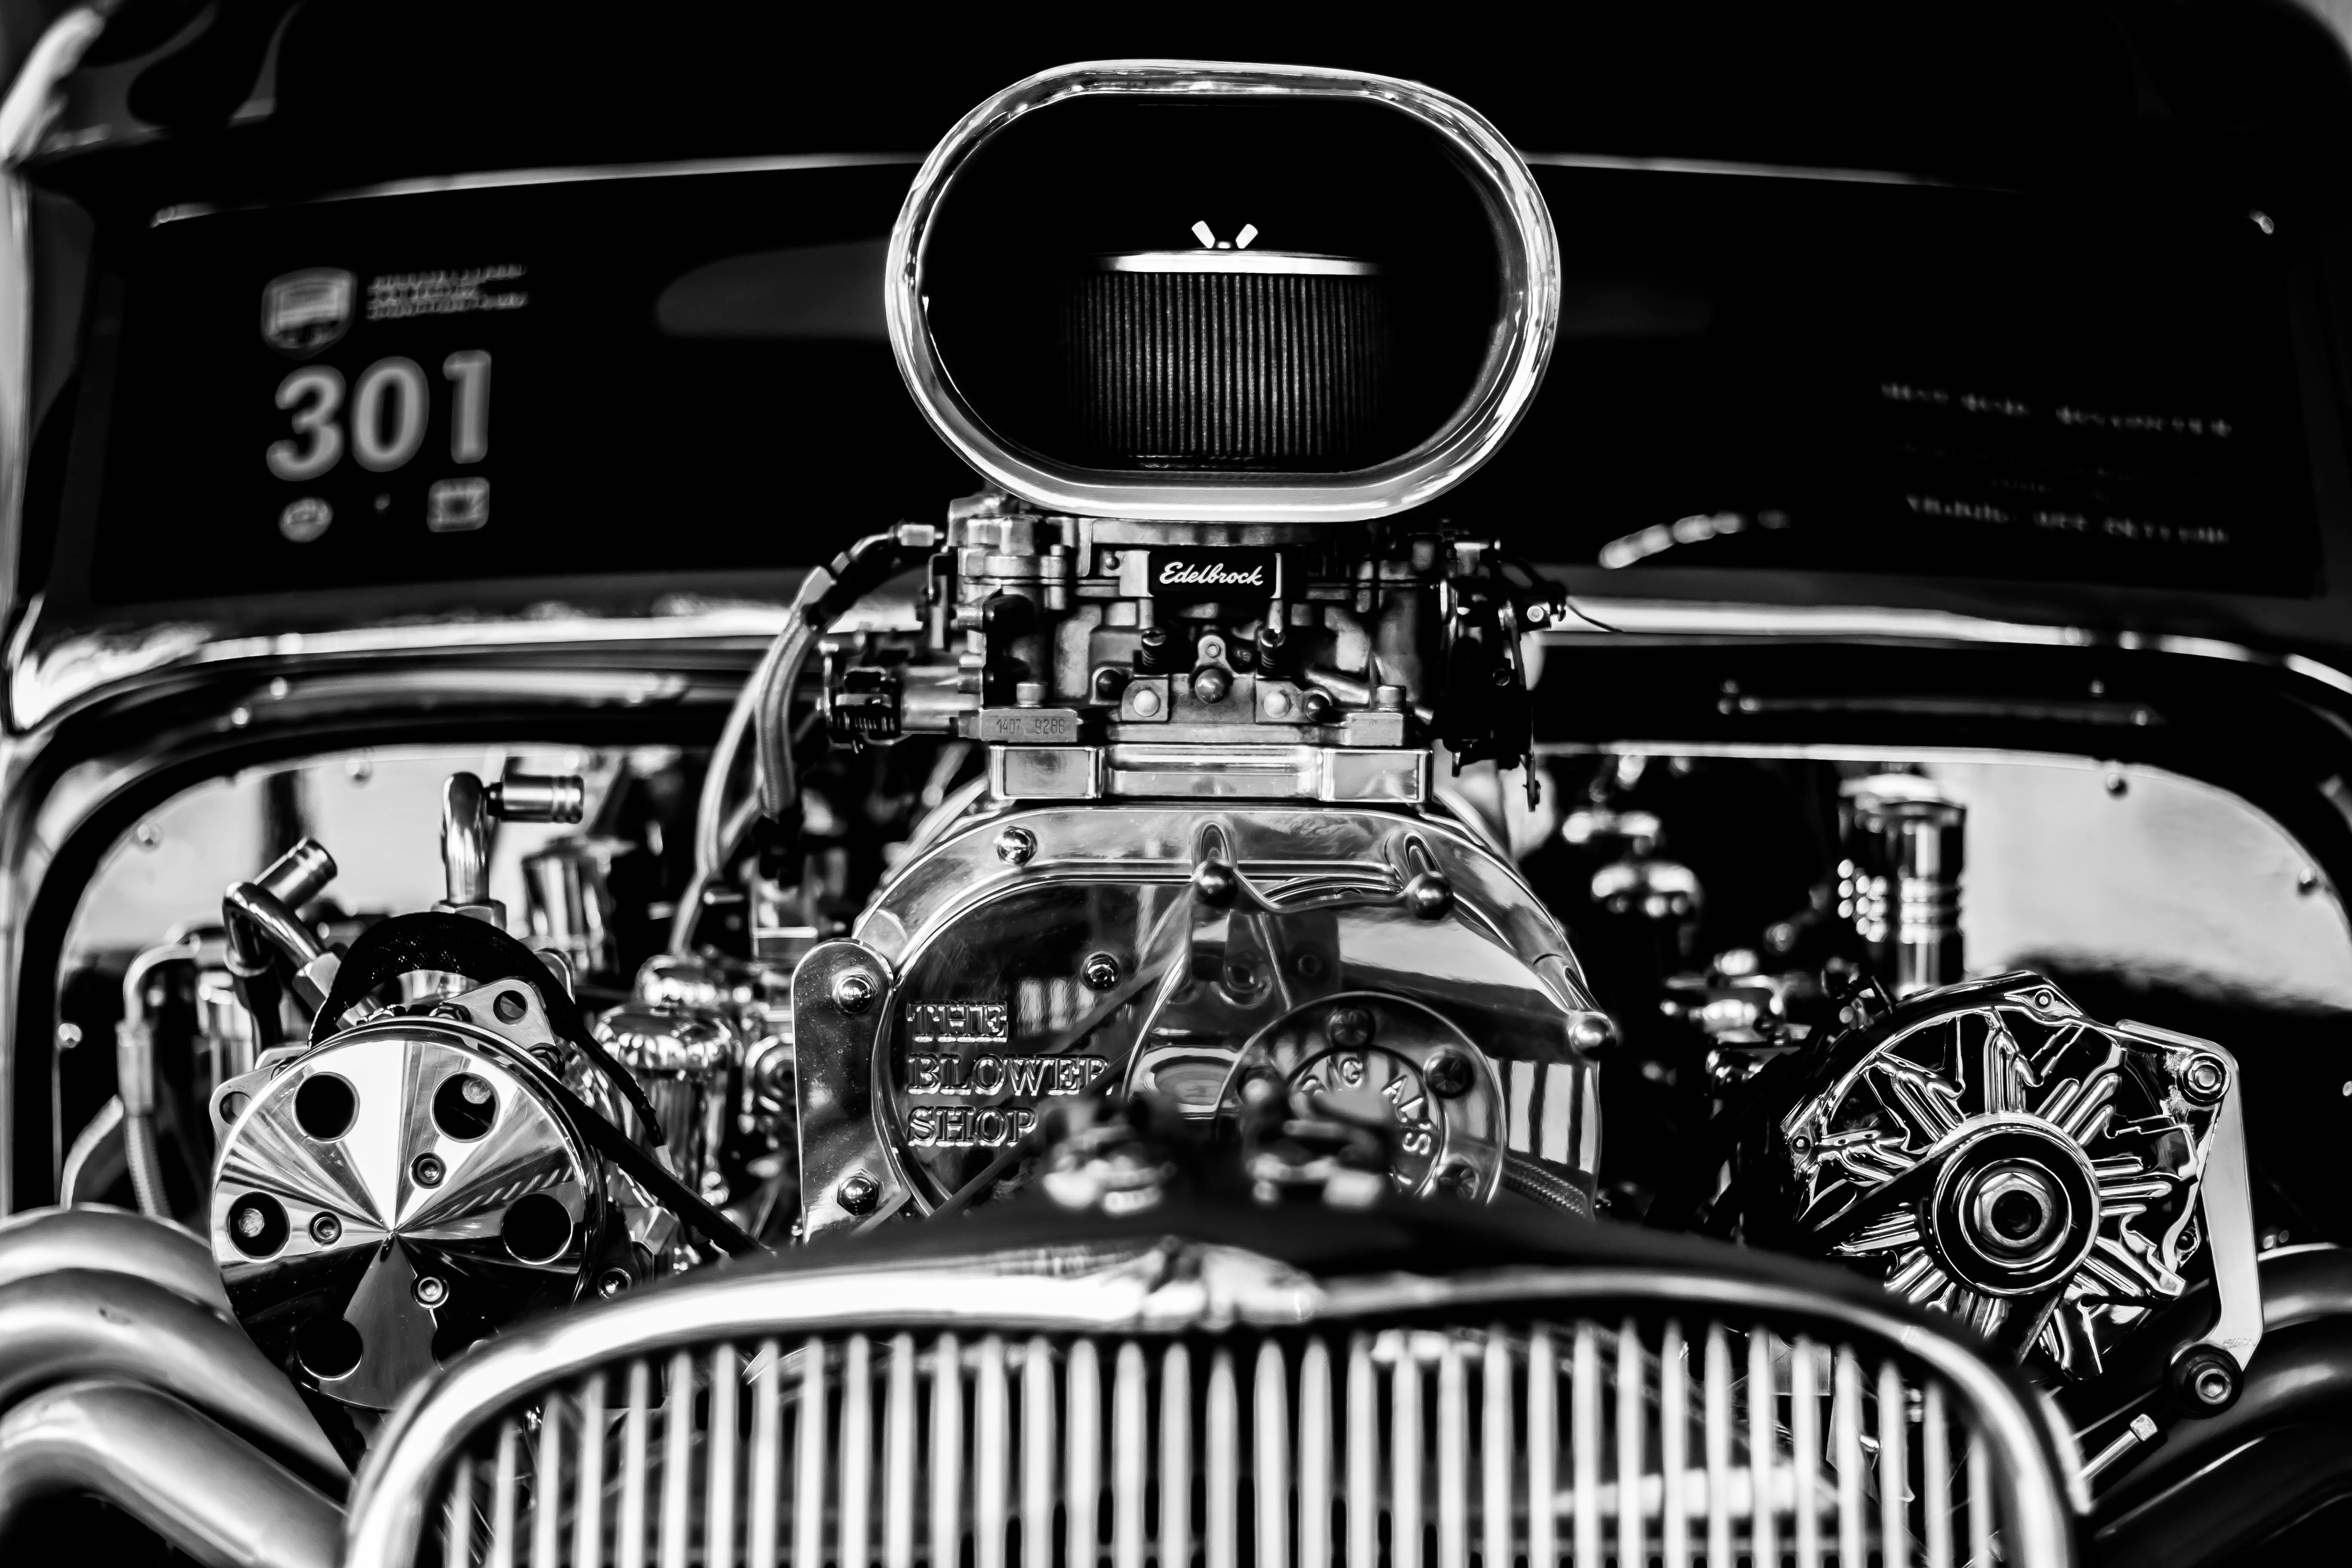 Vintage black and white car engine